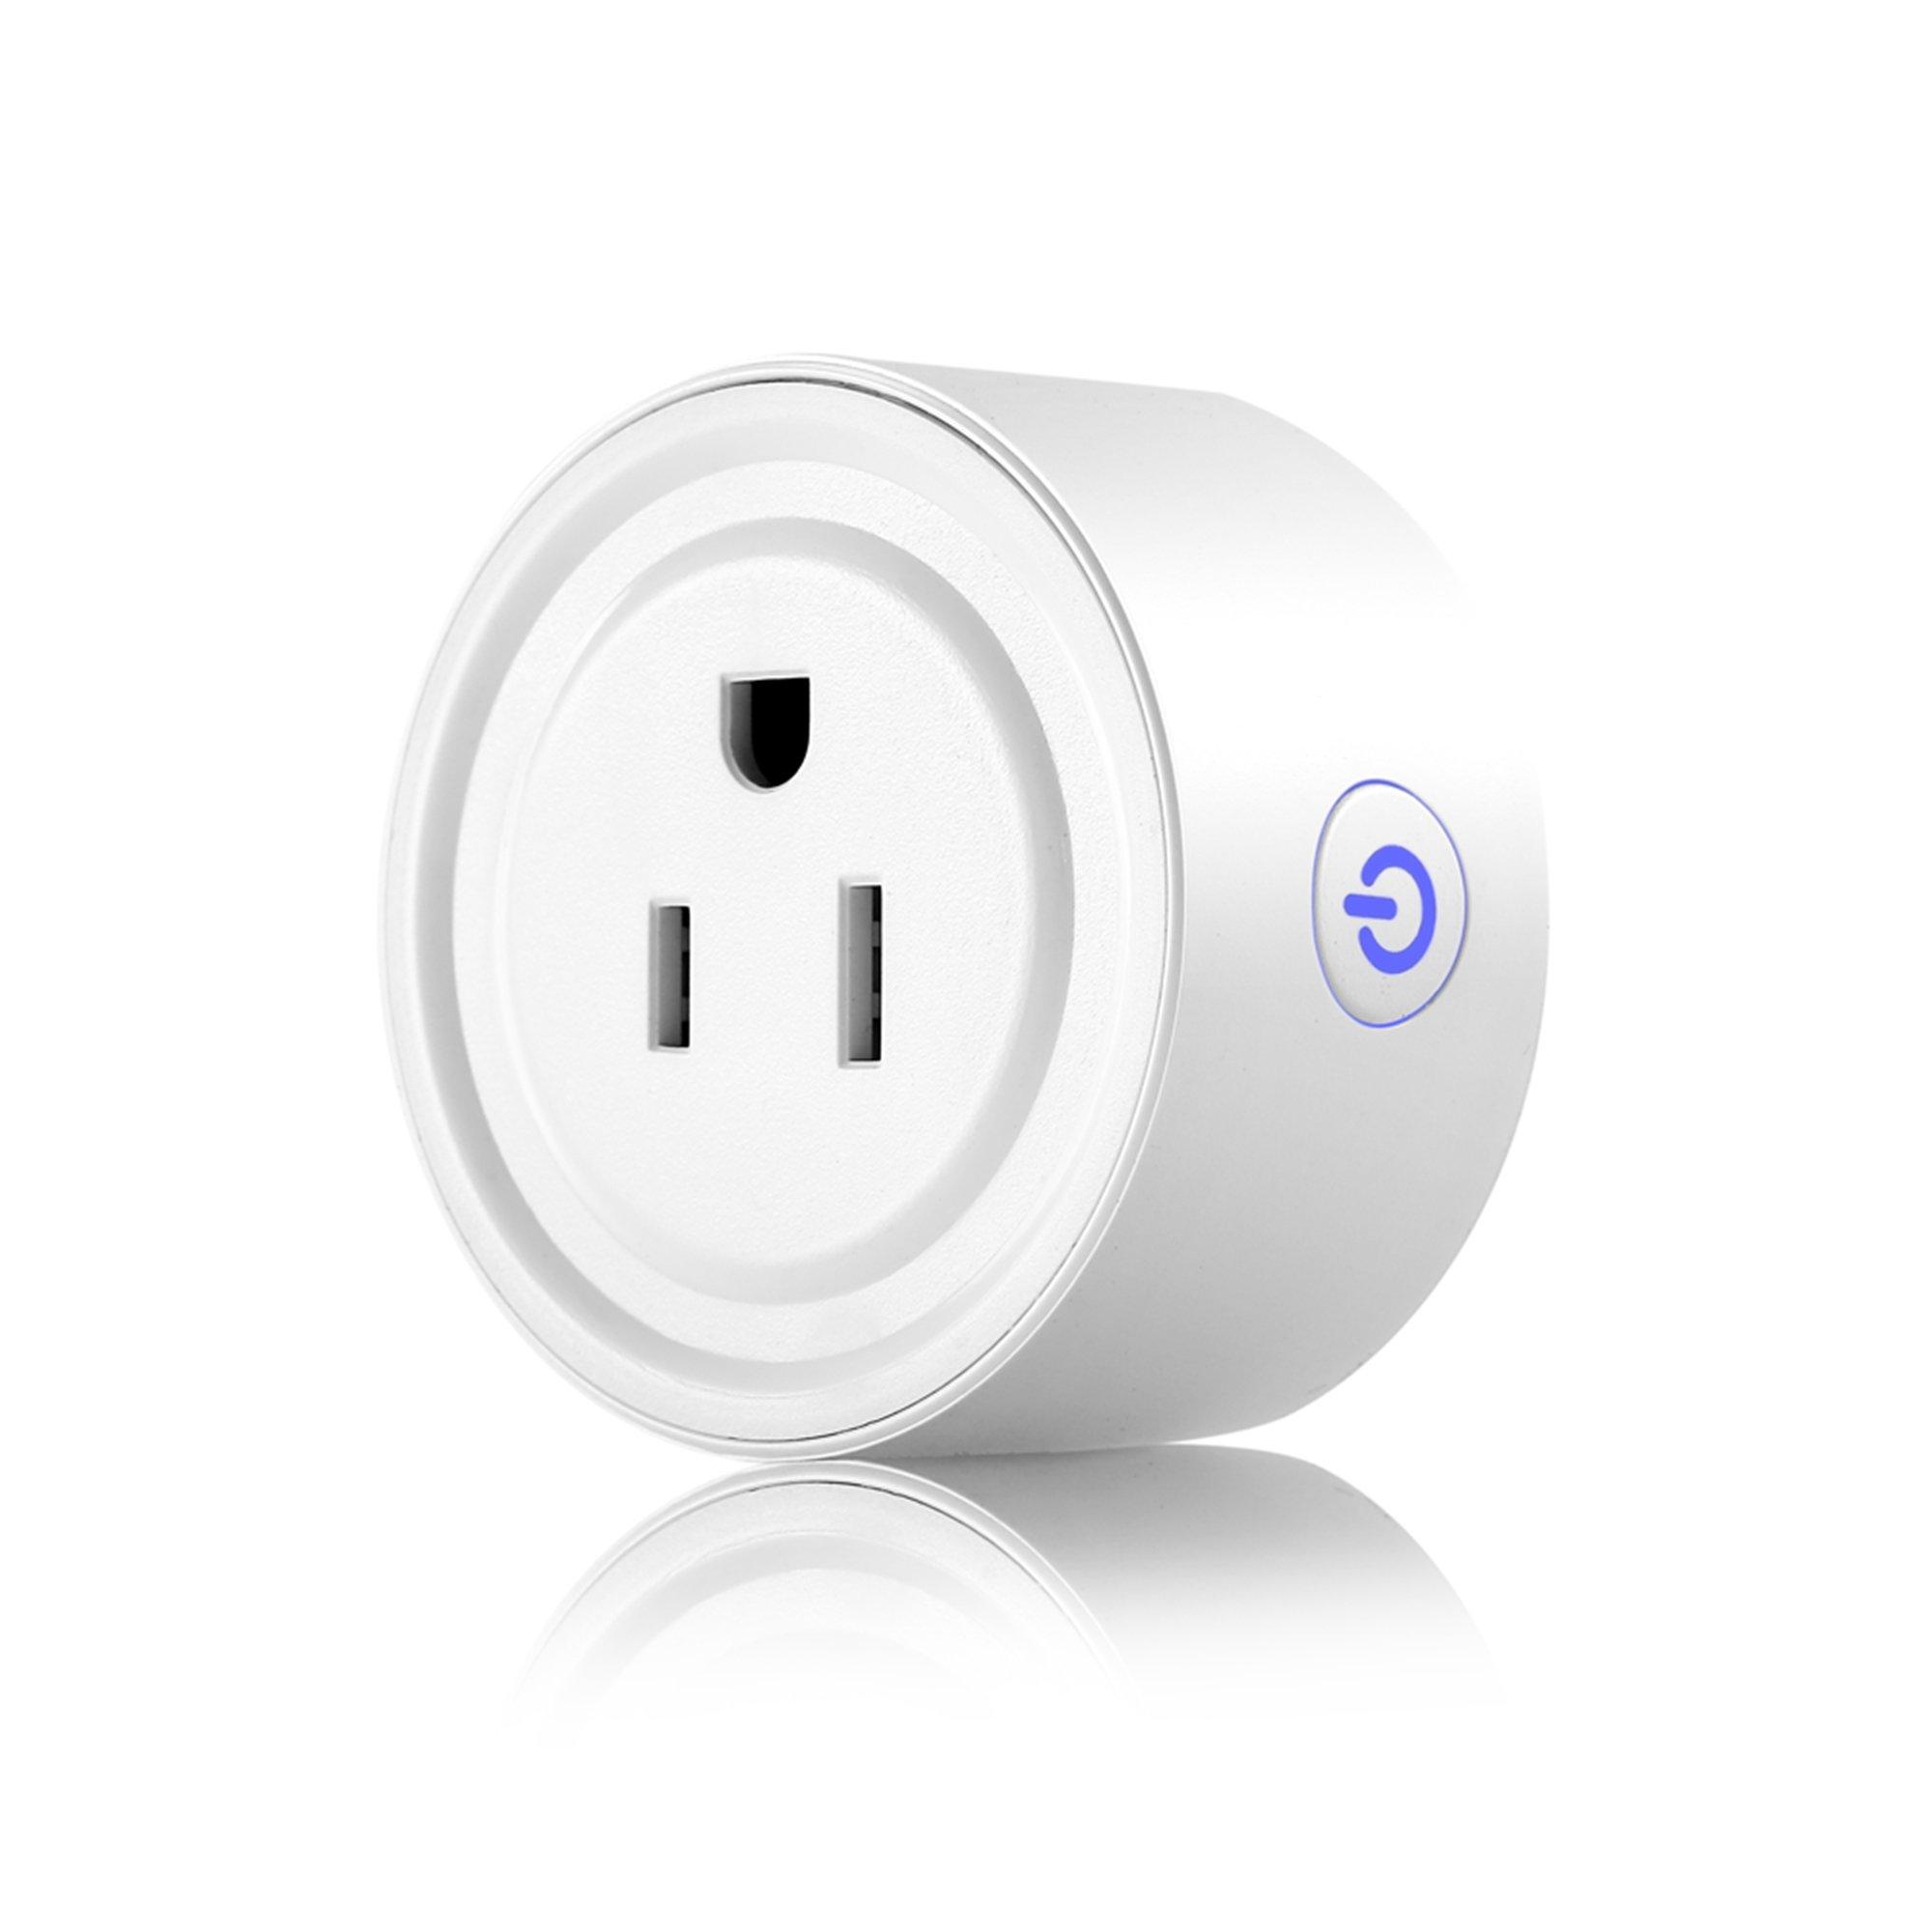 Apromio Round 10A Wi-Fi Enabled Mini Smart Socket Works with Amazon Alexa Google Home Plug